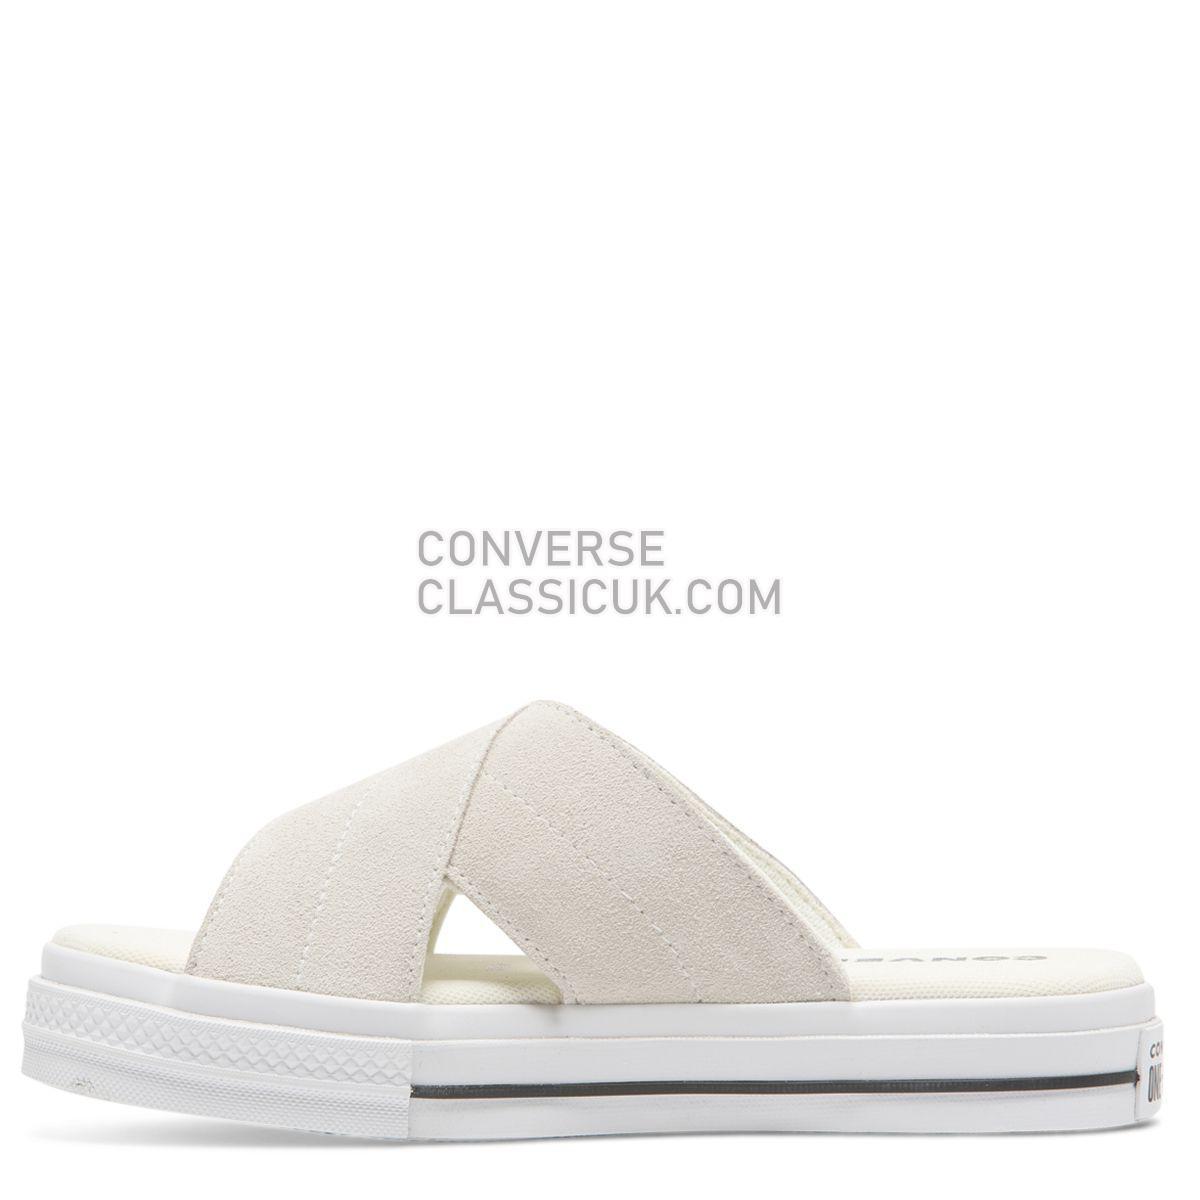 Converse One Star Sandal Slip Egret Womens 564144 Egret/Egret/White Shoes